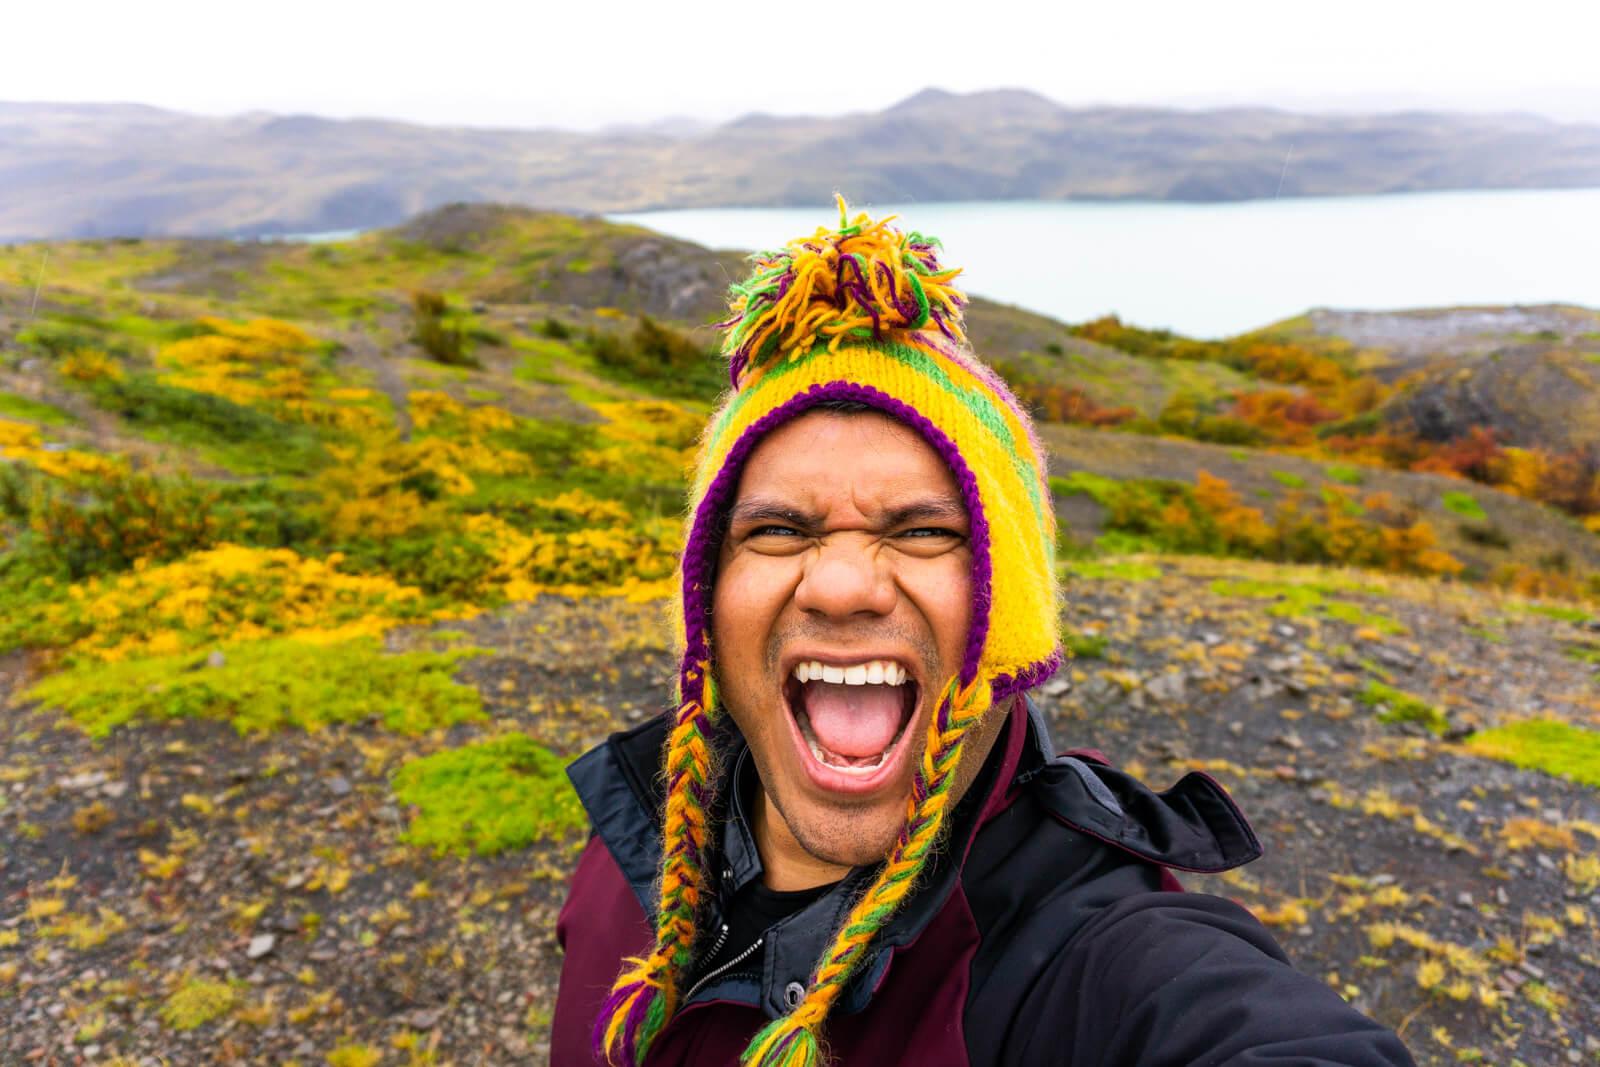 Torres del Paine W Trek Day 02 Selfie of Wonders under the rain